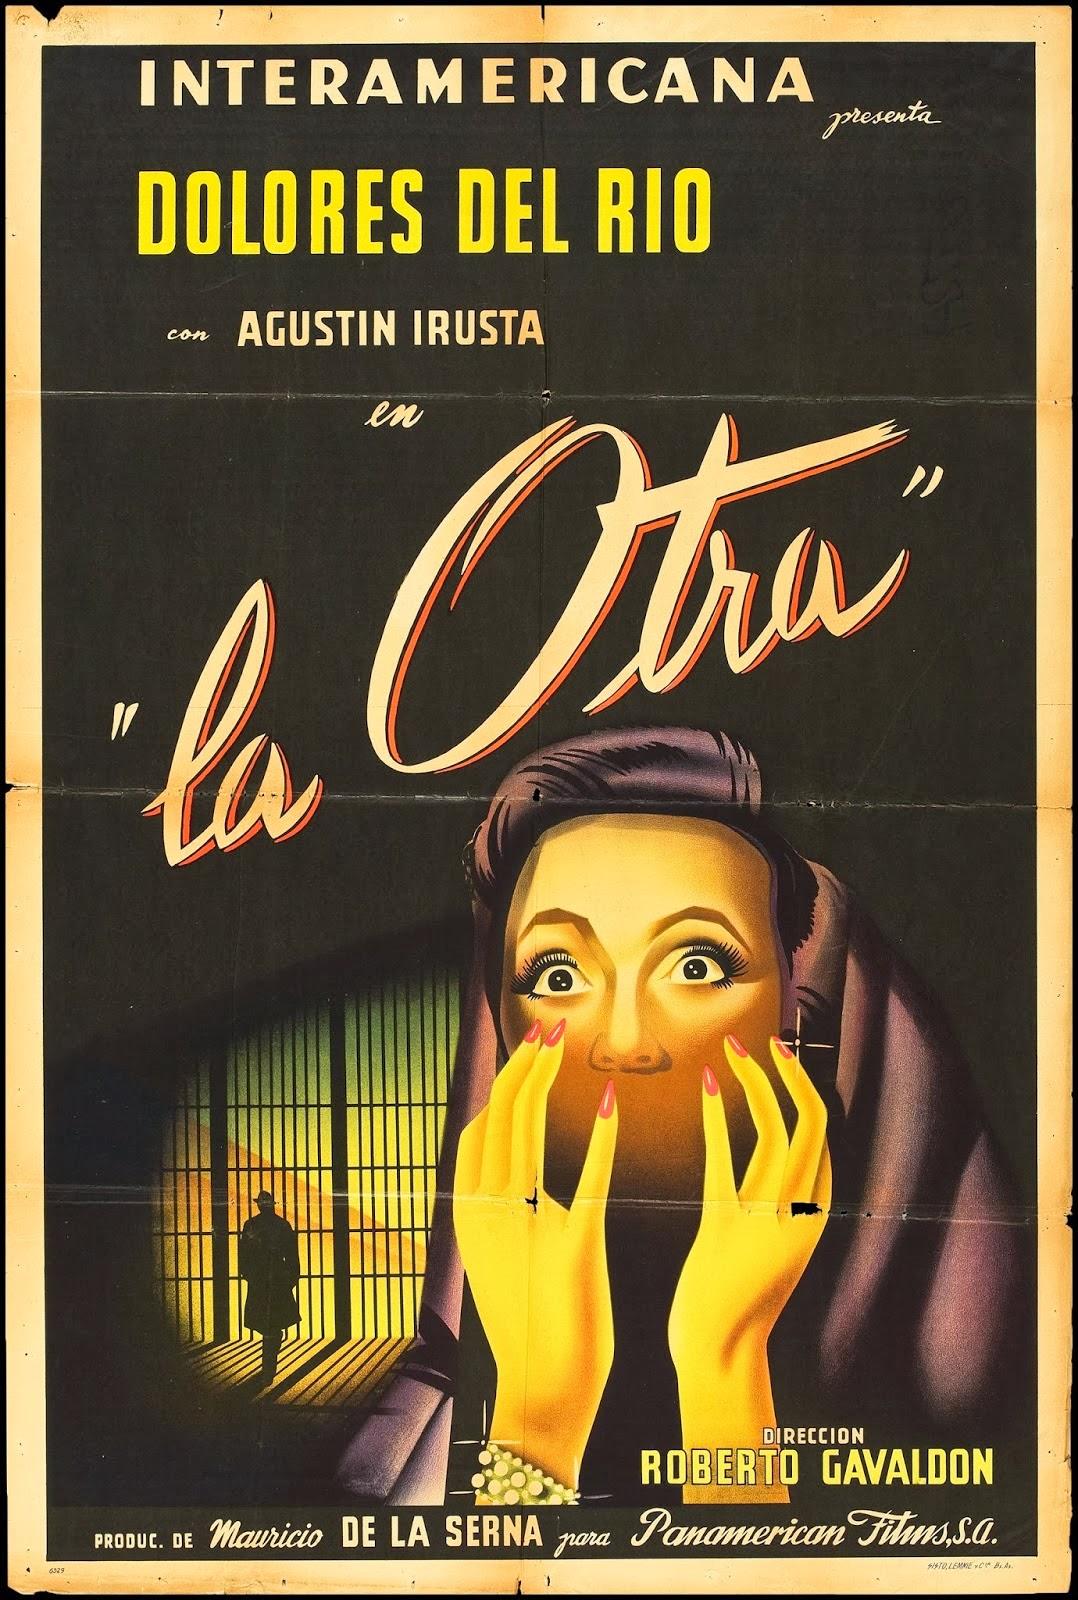 Rosita Quintana moreover Drmas 2 as well 2011 08 20 archive as well 654137 las Ultimas Divas besides Tlu8zss ega. on rosita quintana en la duena